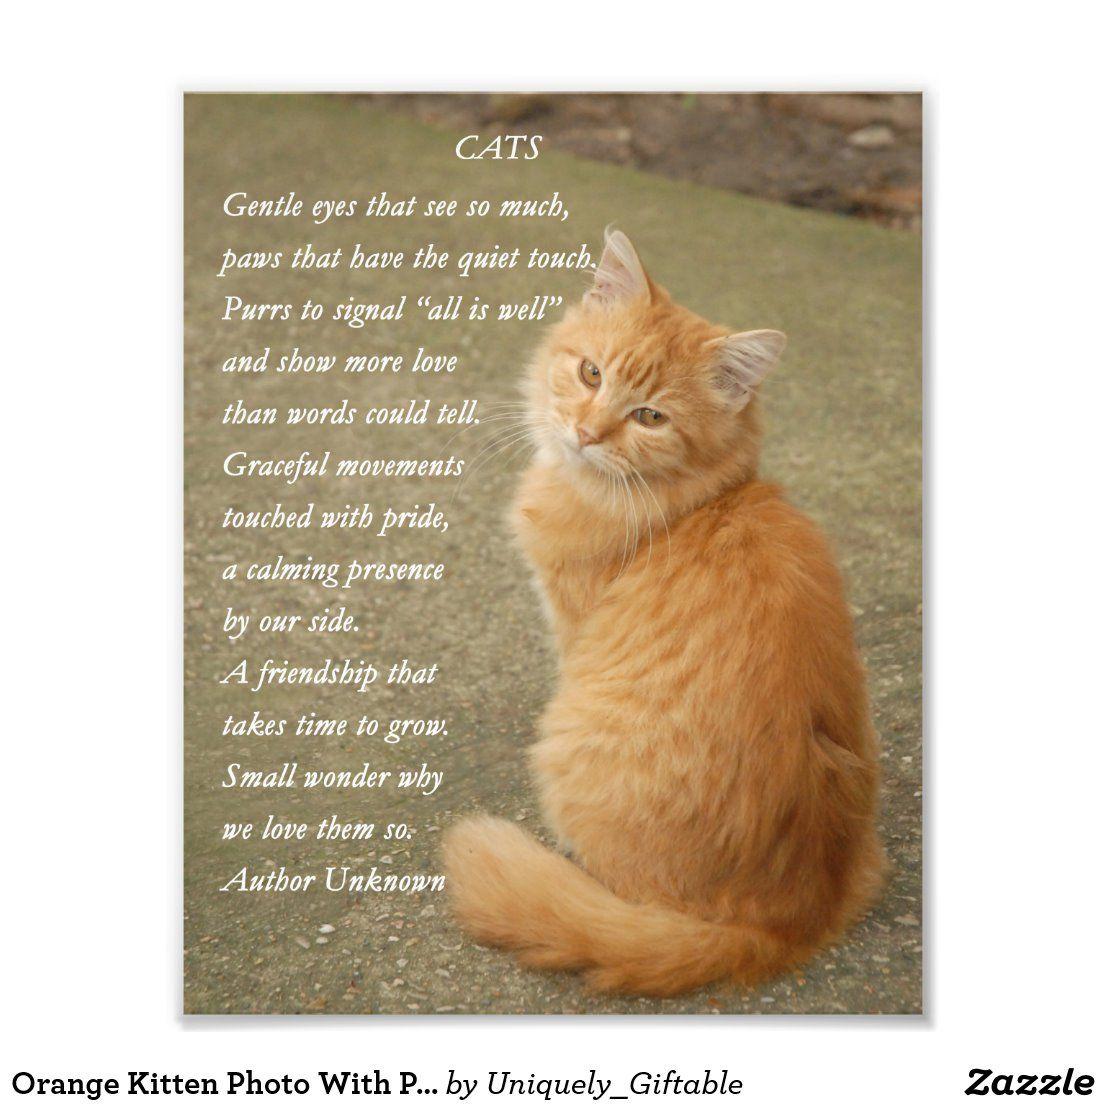 Orange Kitten Photo With Poem Print in 2020